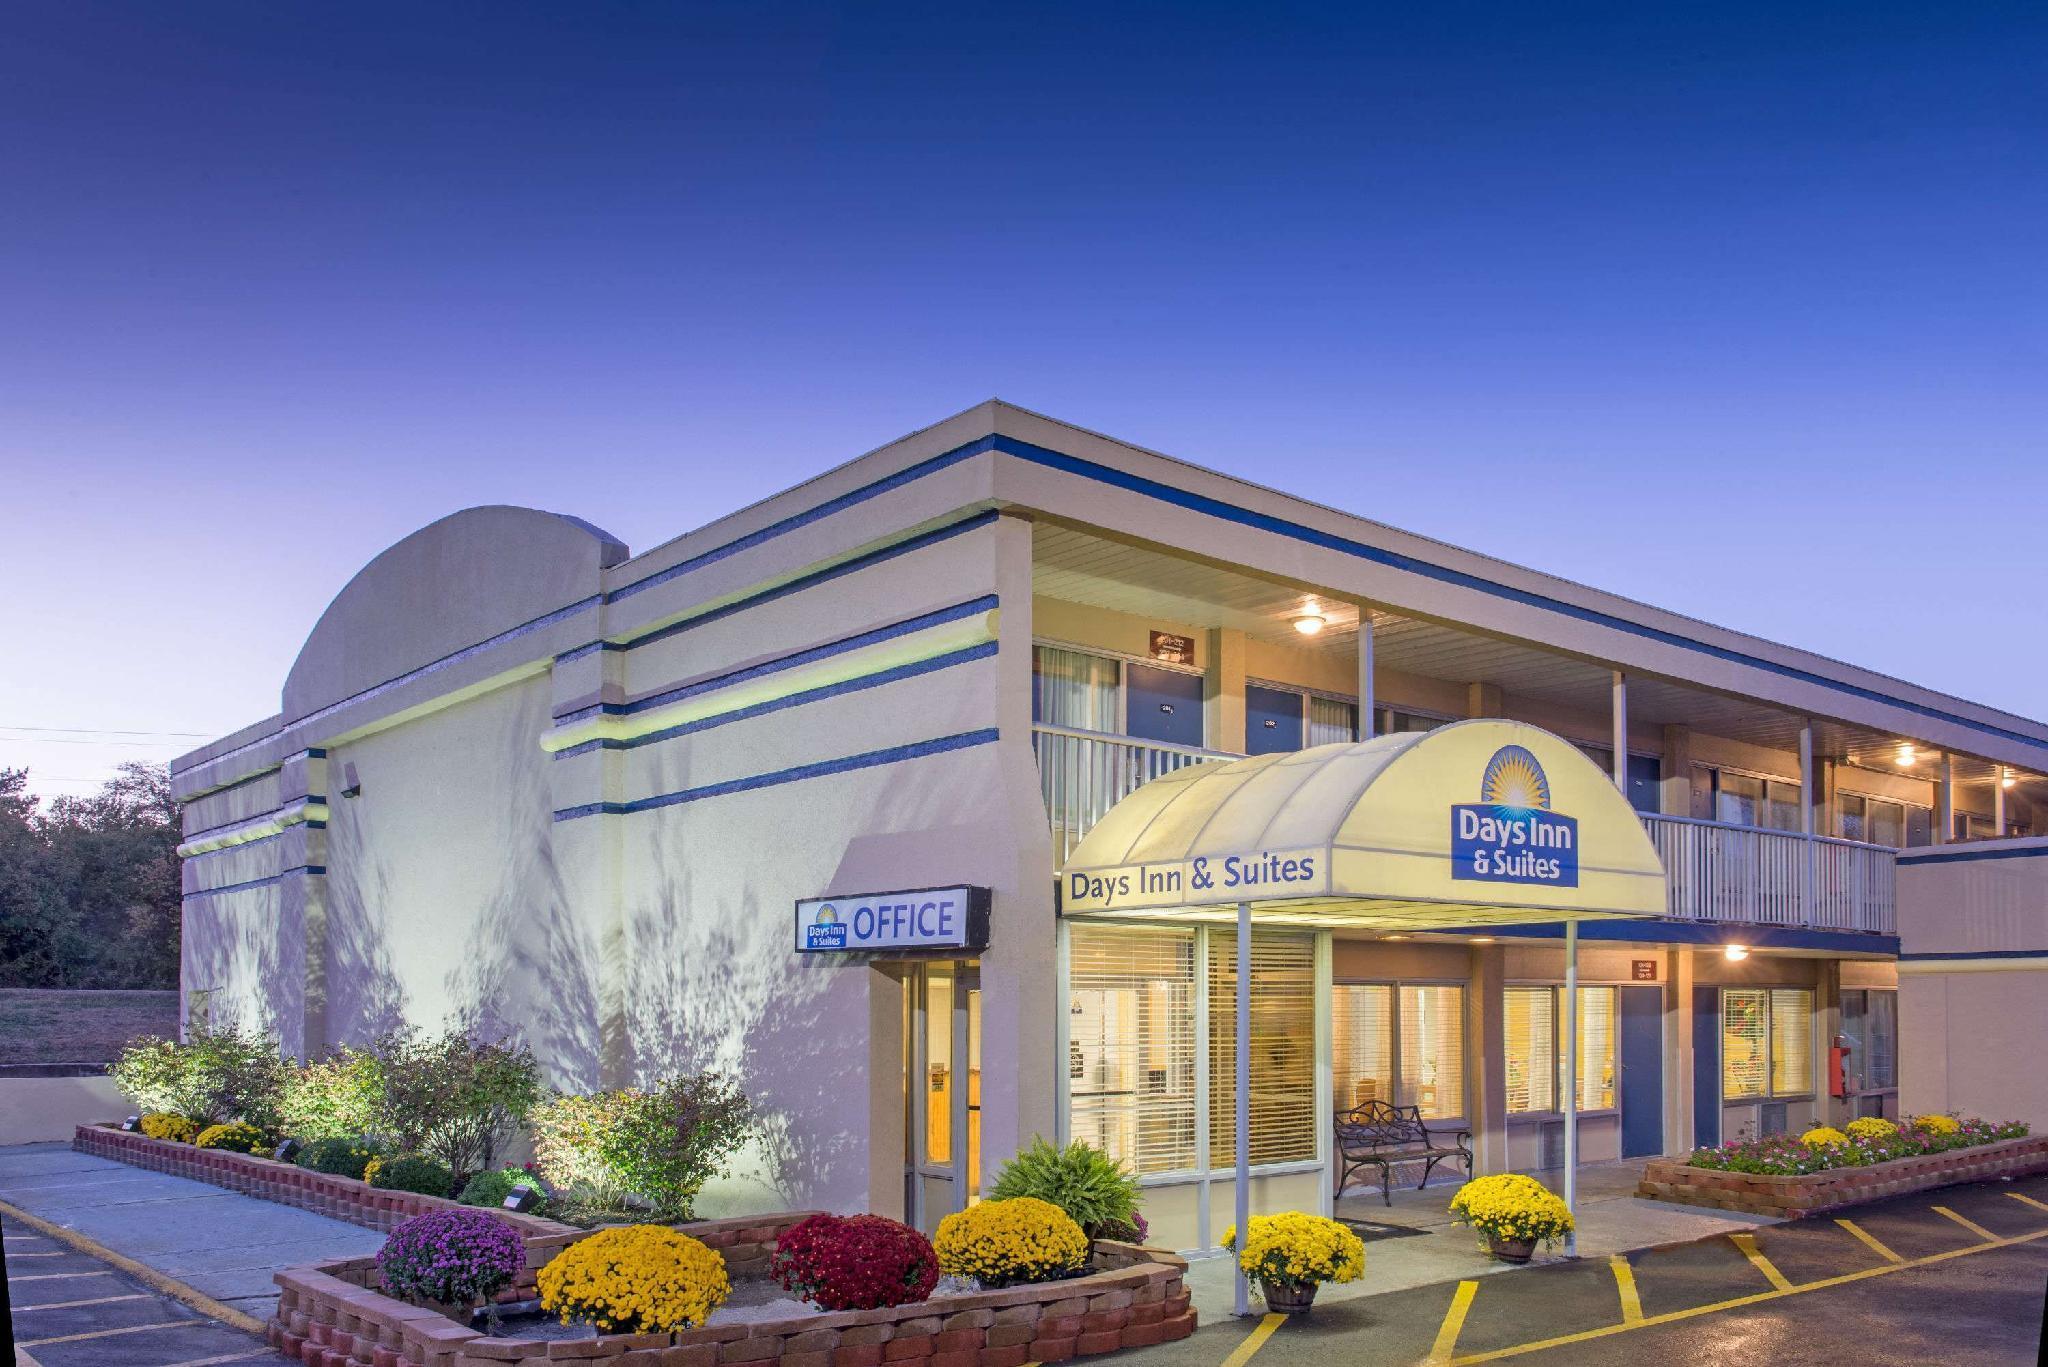 Days Inn And Suites By Wyndham Dayton North